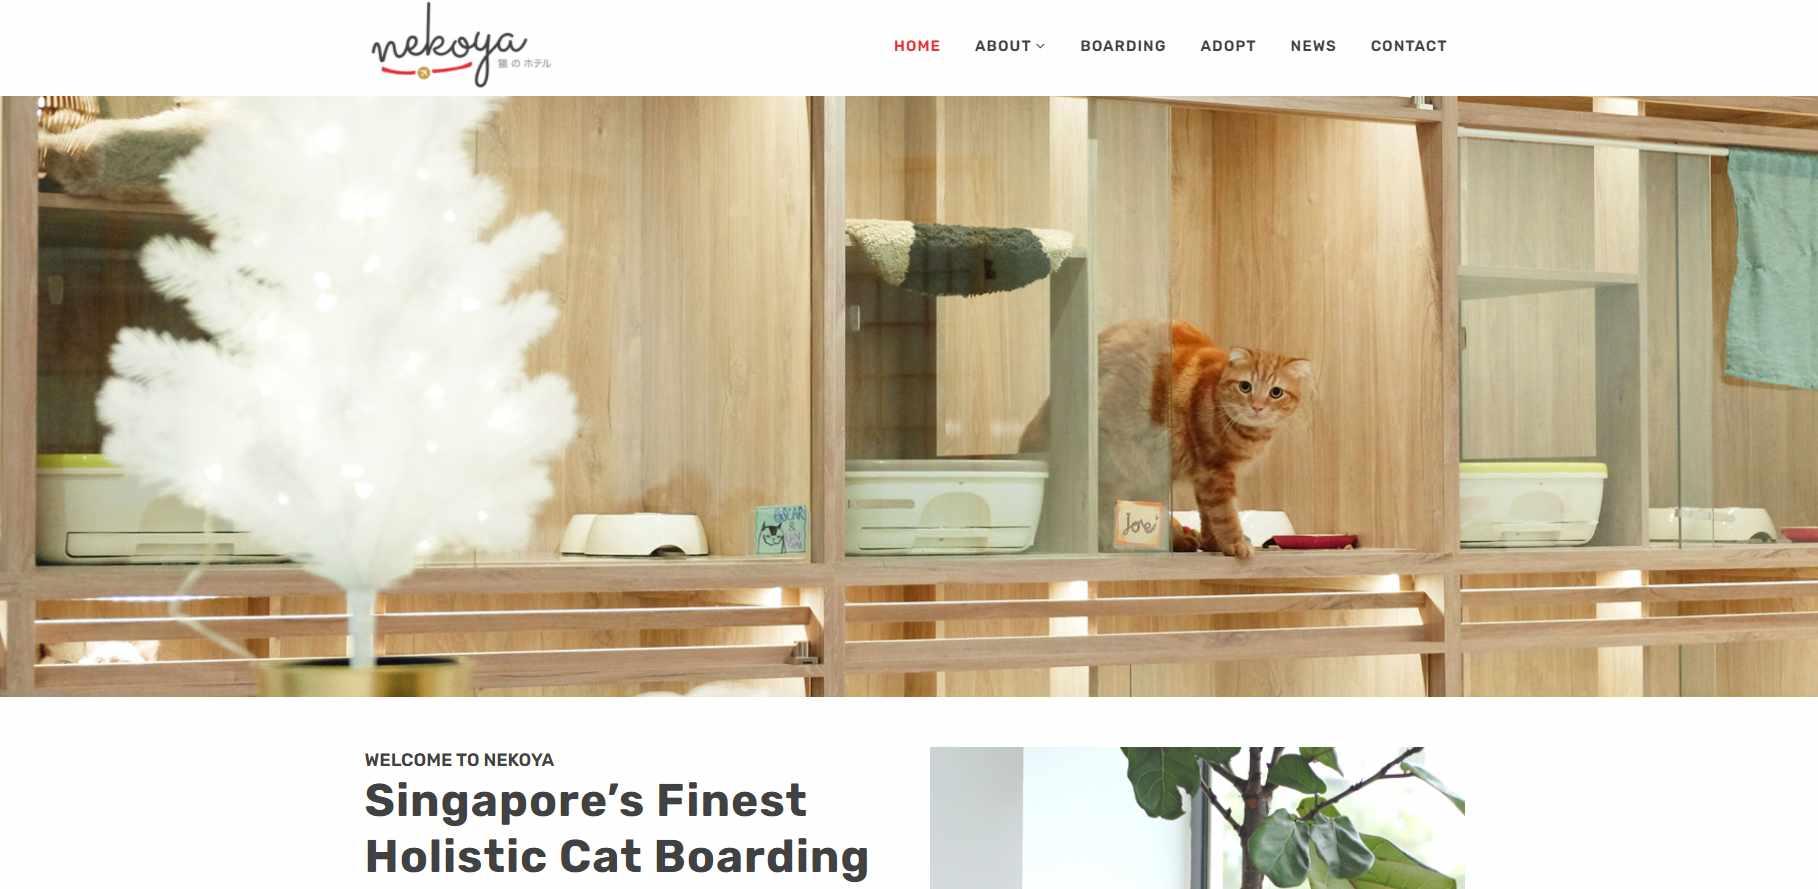 Nekoya Top Pet Hotels in Singapore